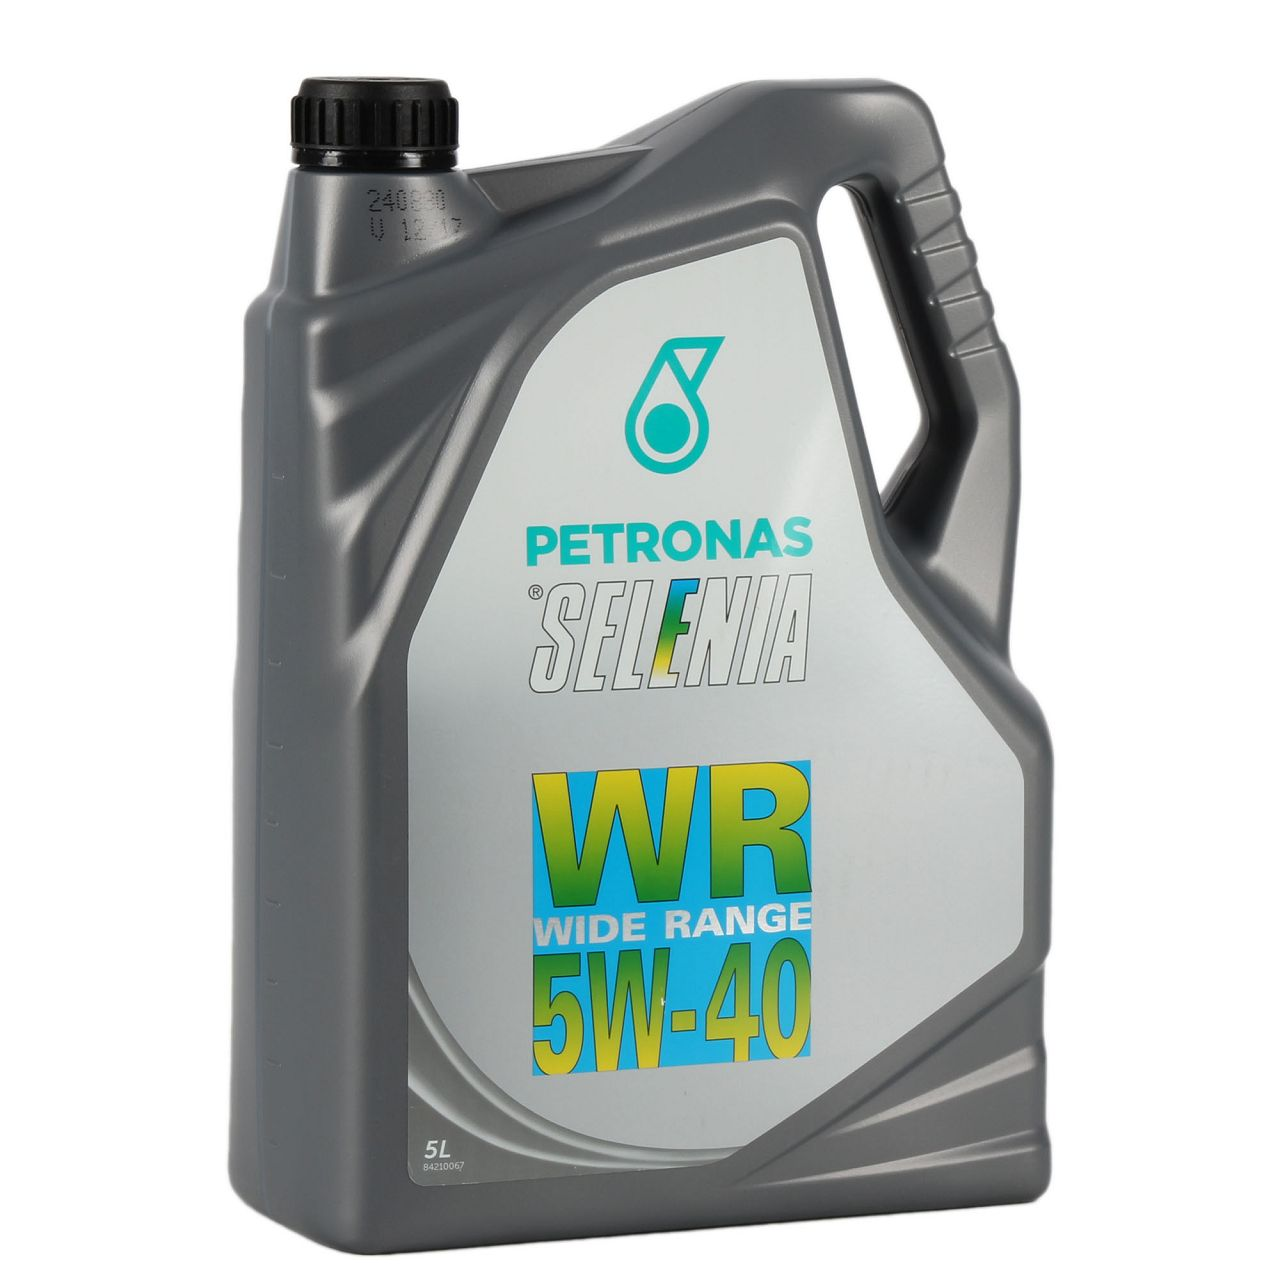 PETRONAS SELENIA Motoröl Öl WR WIDE RANGE 5W40 5W-40 Fiat 9.55535-S3 - 5 Liter